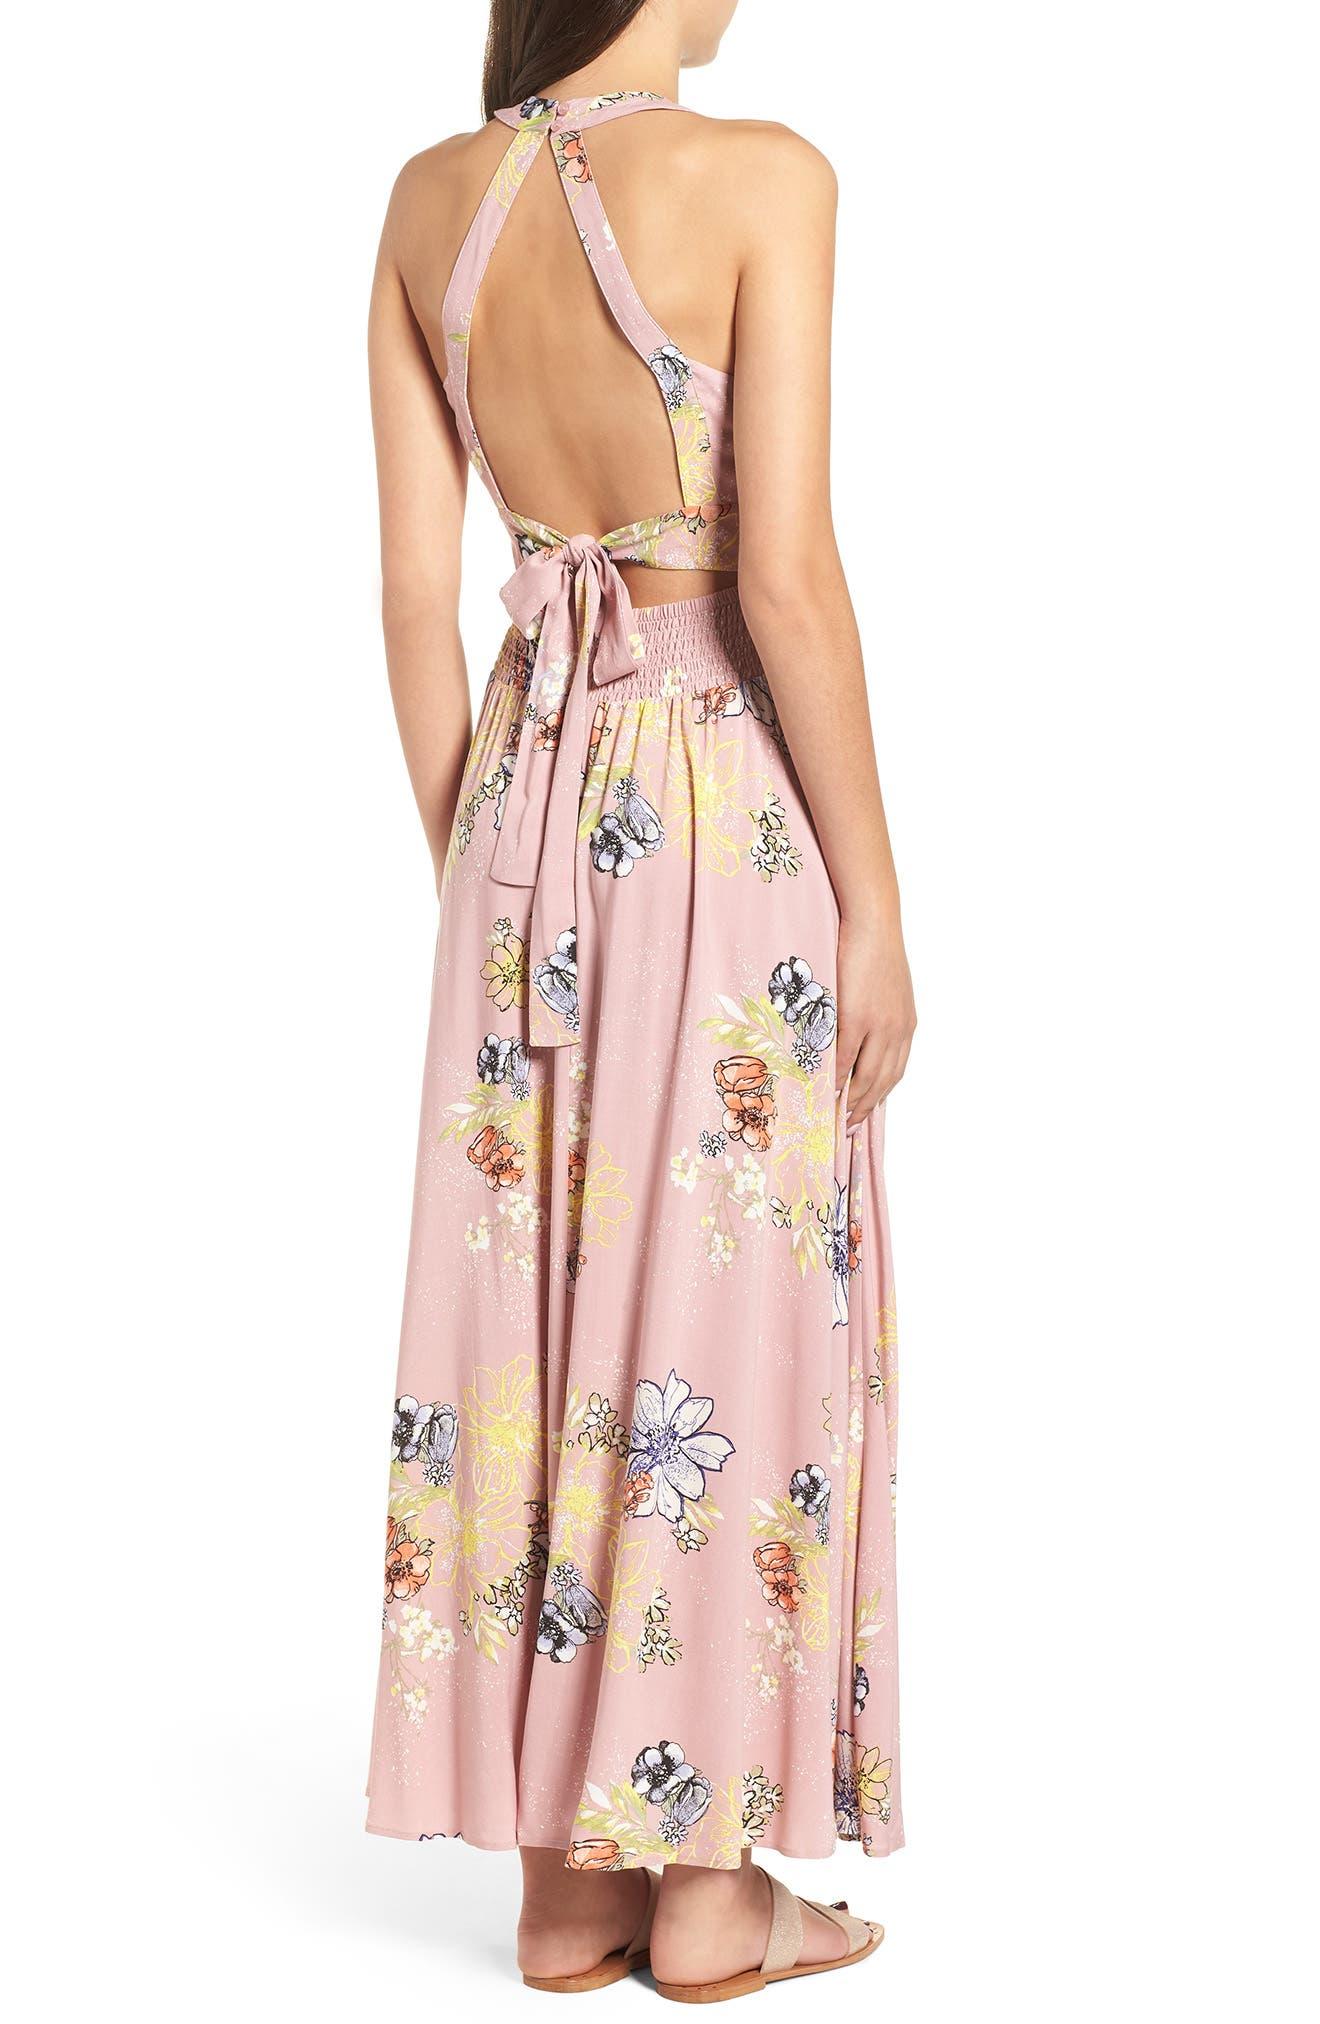 Floral Print Halter Maxi Dress,                             Alternate thumbnail 2, color,                             PINK EGRET ABSTRACT FLORAL